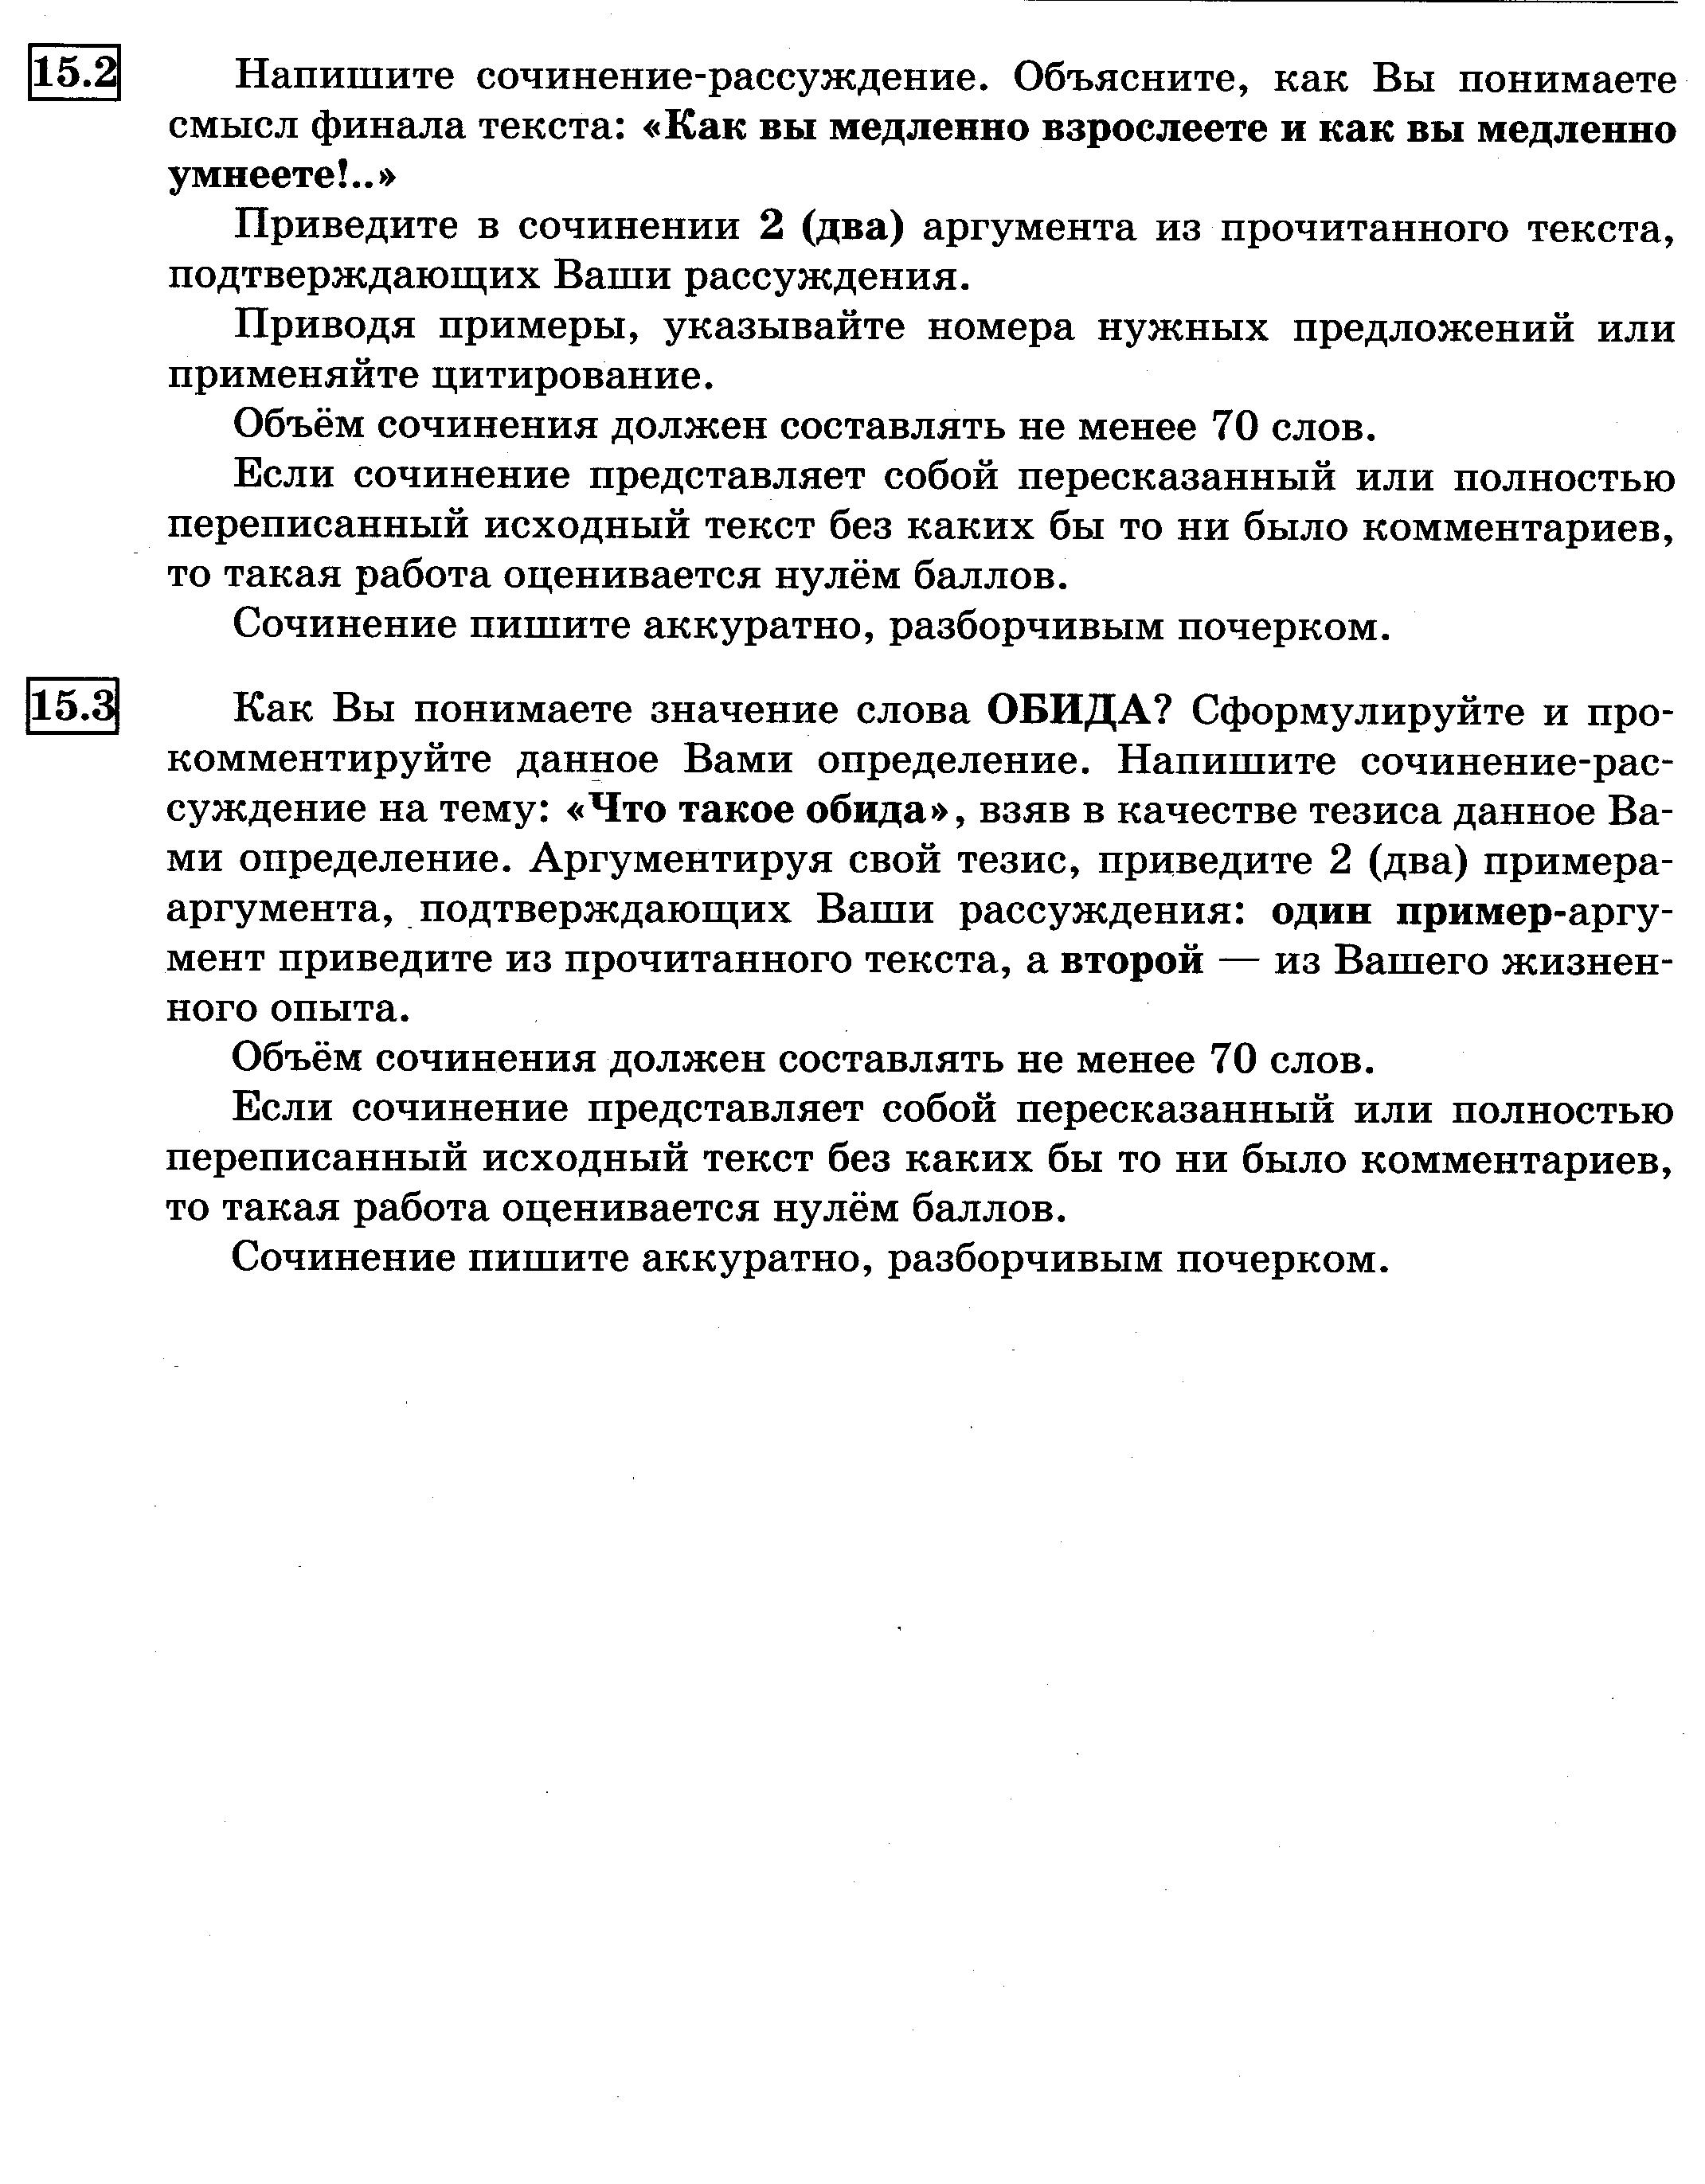 C:\Documents and Settings\Наташа\Рабочий стол\ОГЭ 2016\КИМы Степановой ОГЭ-2016\img298.jpg